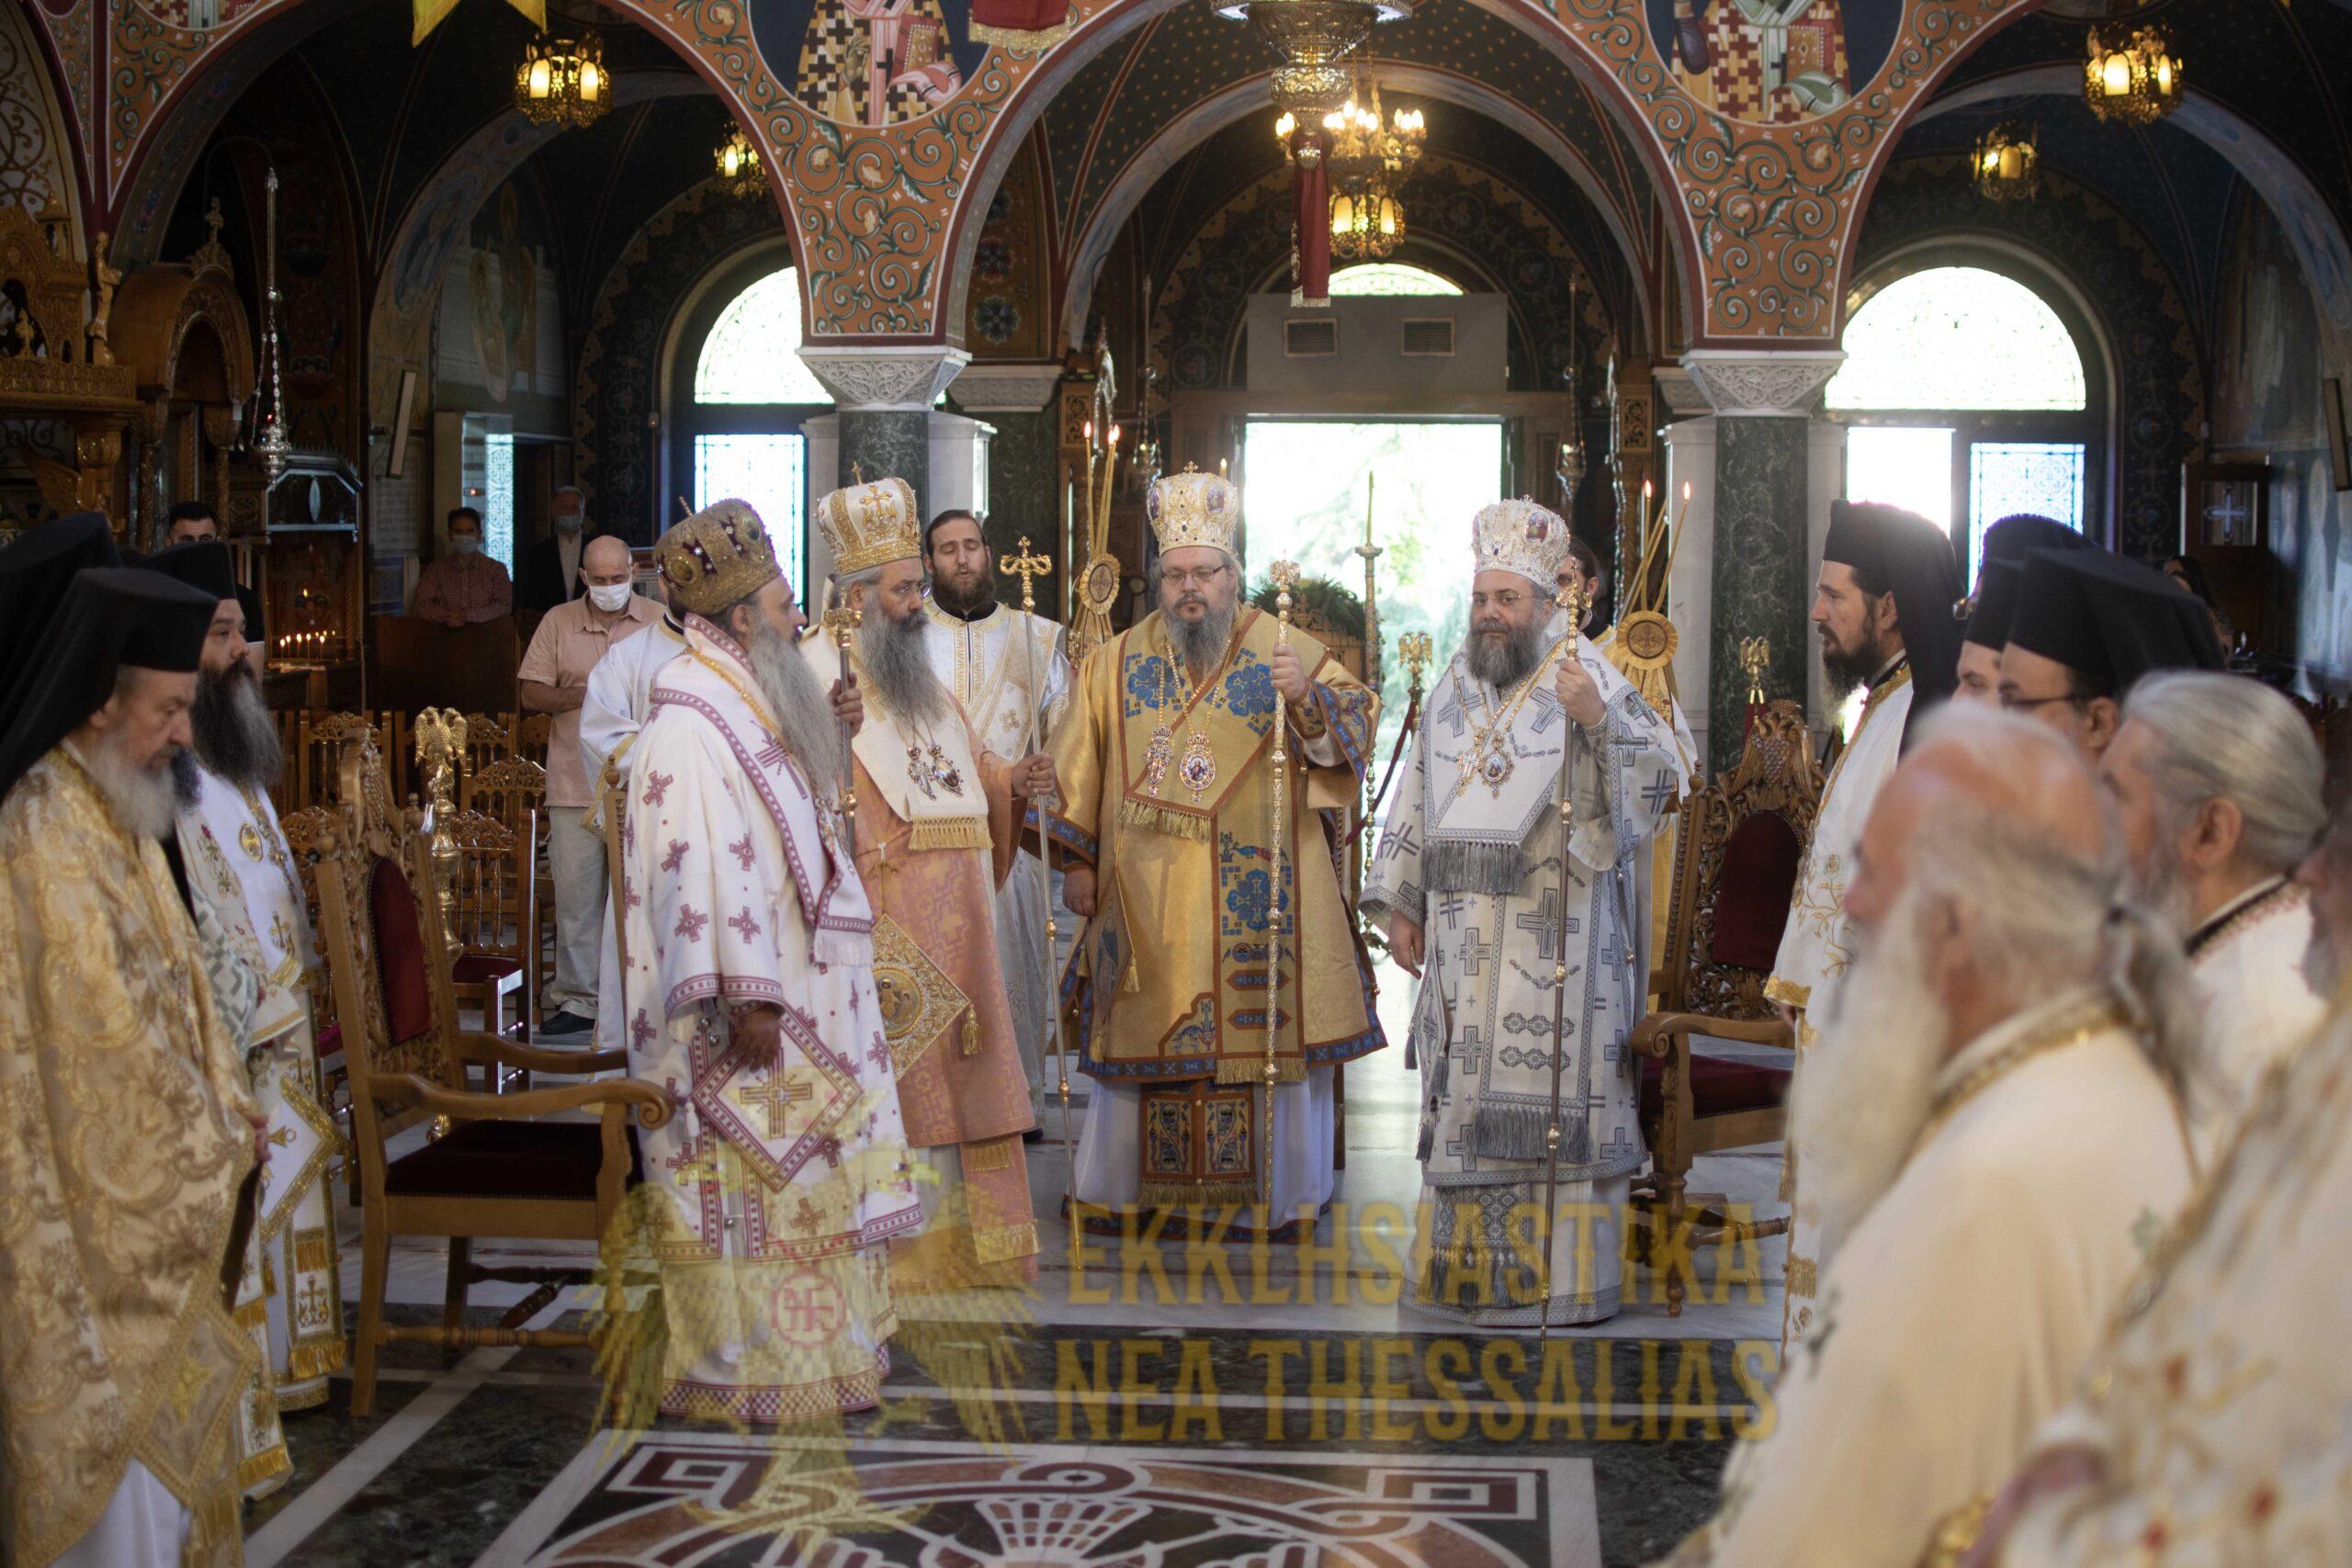 Tα Ονομαστήρια του Μητροπολίτου Λαρίσης και Τυρνάβου κ Ιερωνύμου